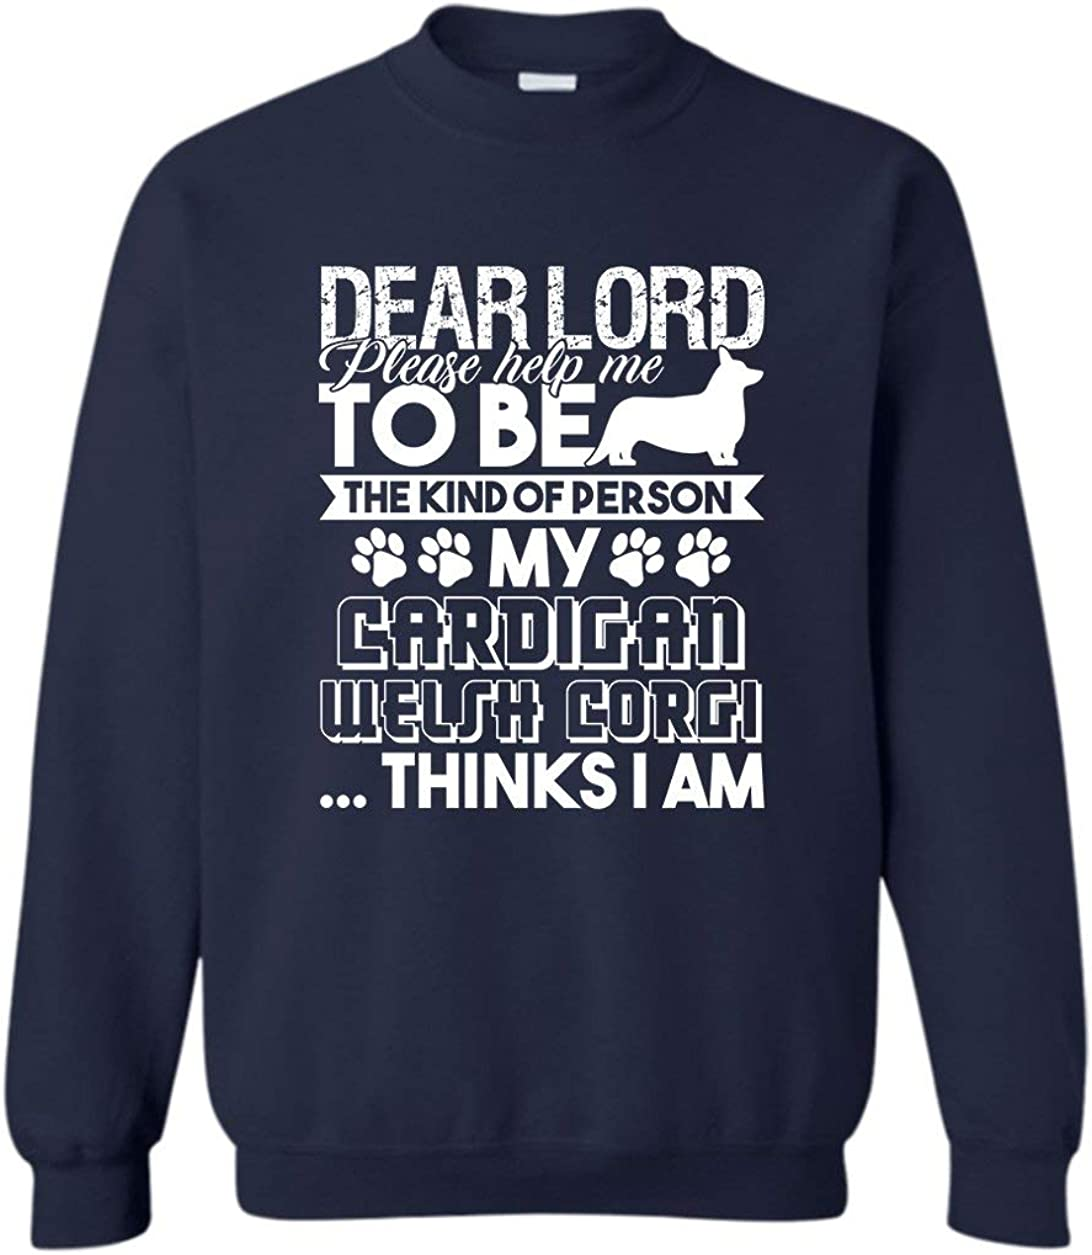 Cardigan Welsh Sacramento Mall Corgi Owner Crewneck Unisex Daily bargain sale Sweatshirt Sweatshir